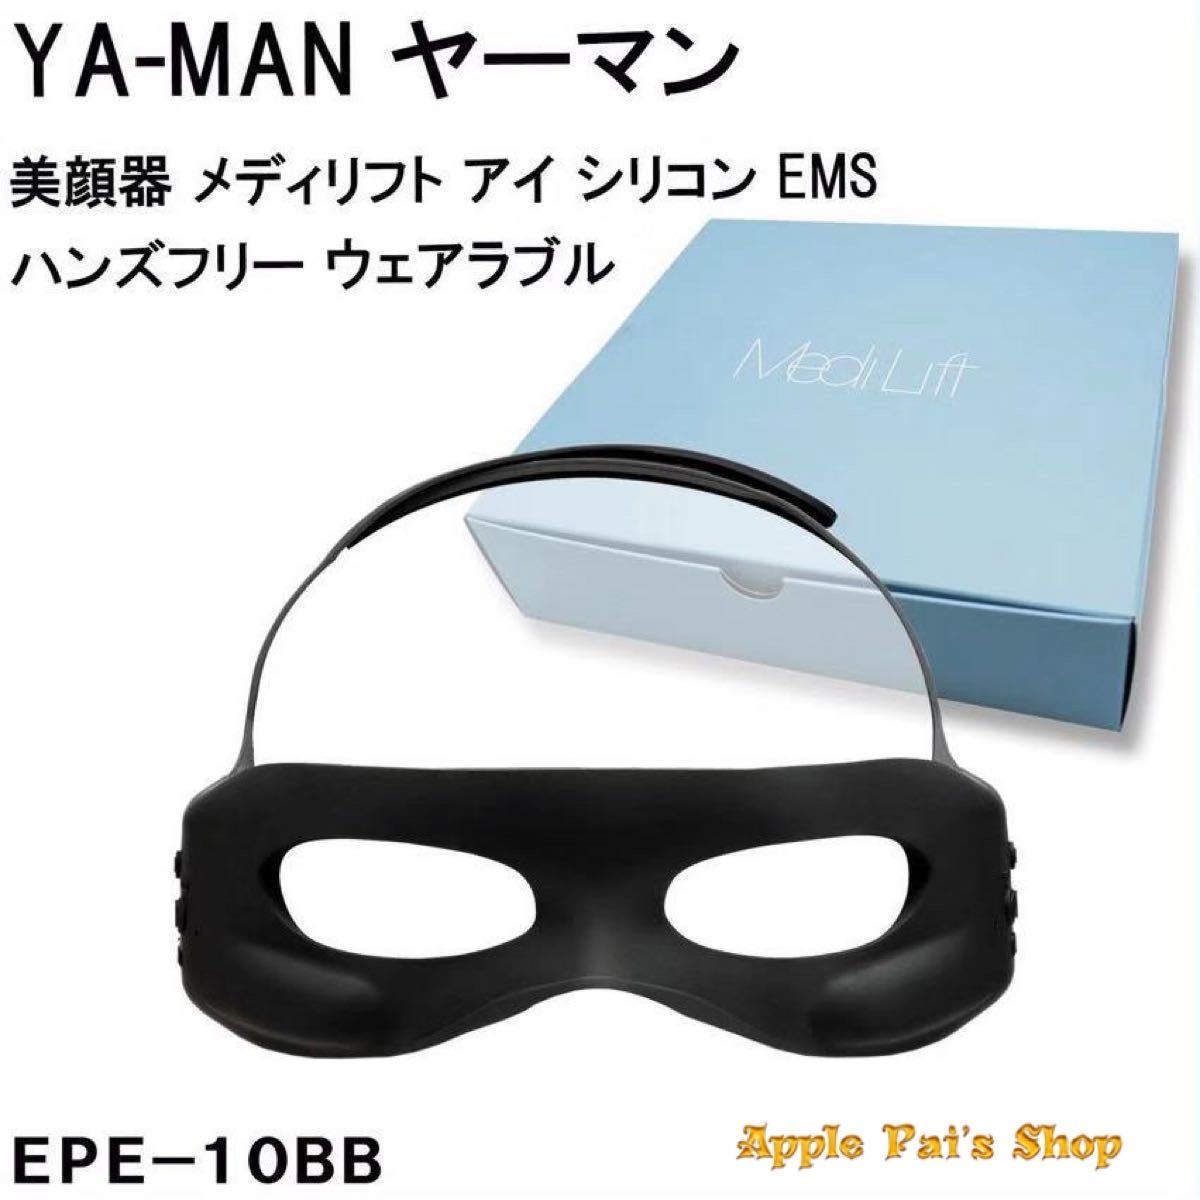 YAMAN ヤーマン 美顔器 メディリフト アイ シリコン EPE-10BB